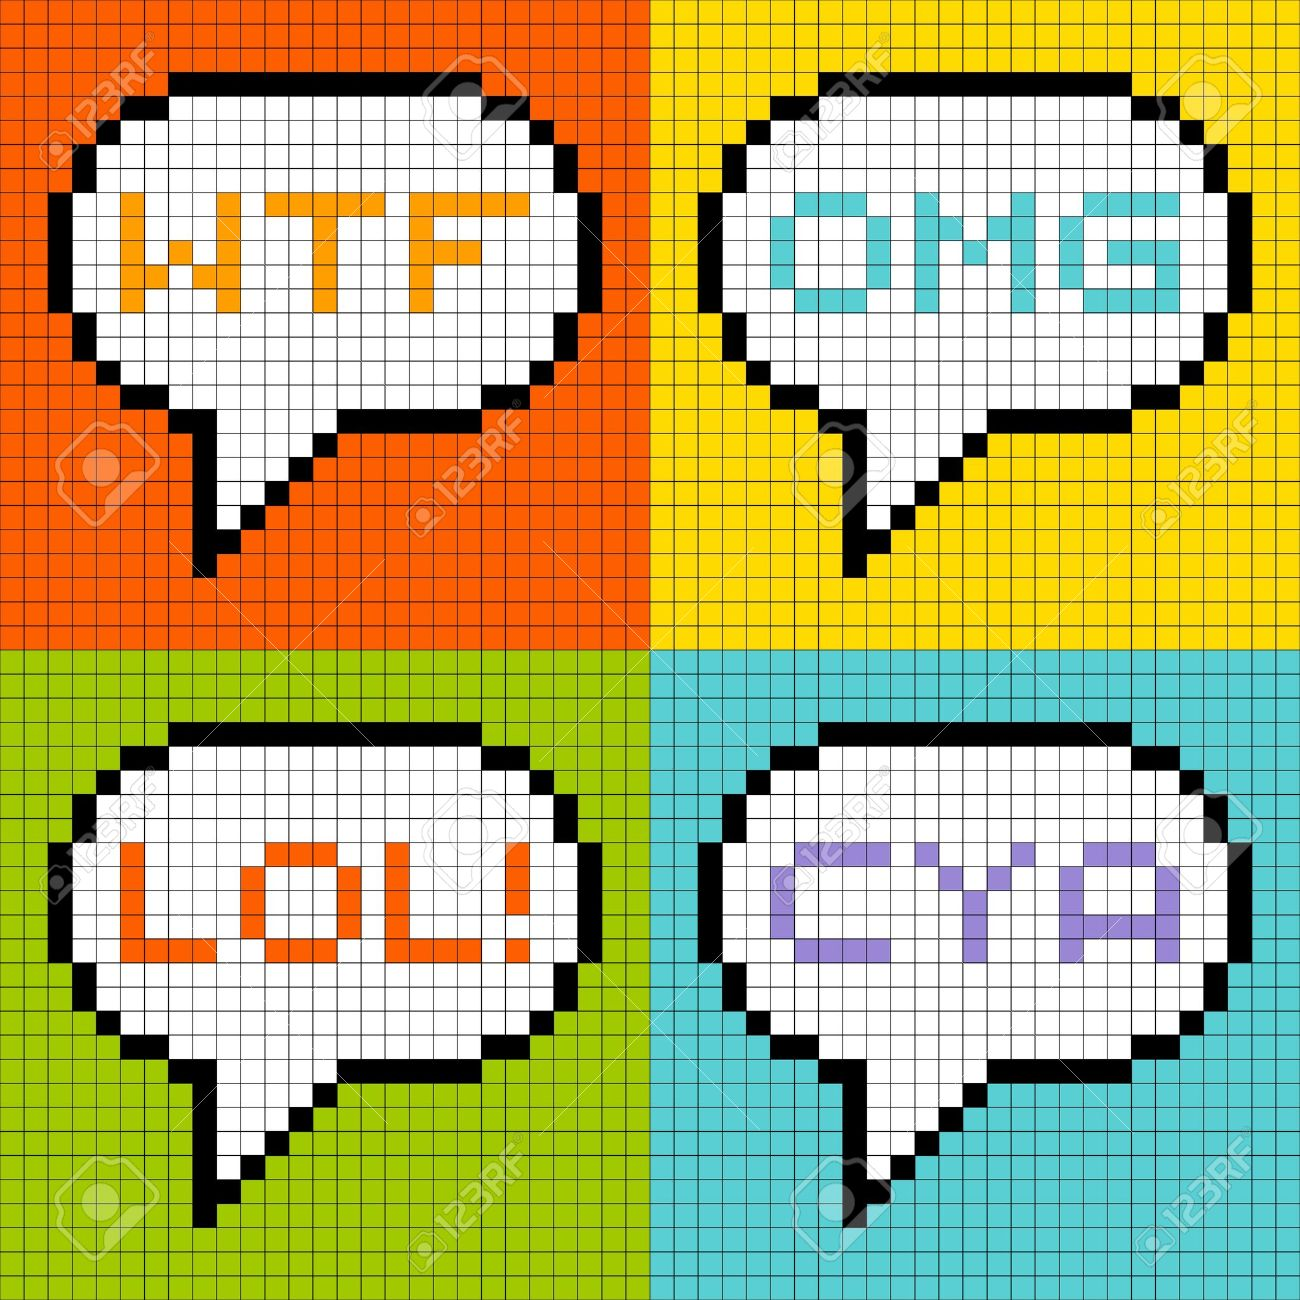 8-bit pixel representation of common 3-letter acronyms in speech bubbles Stock Vector - 19026158